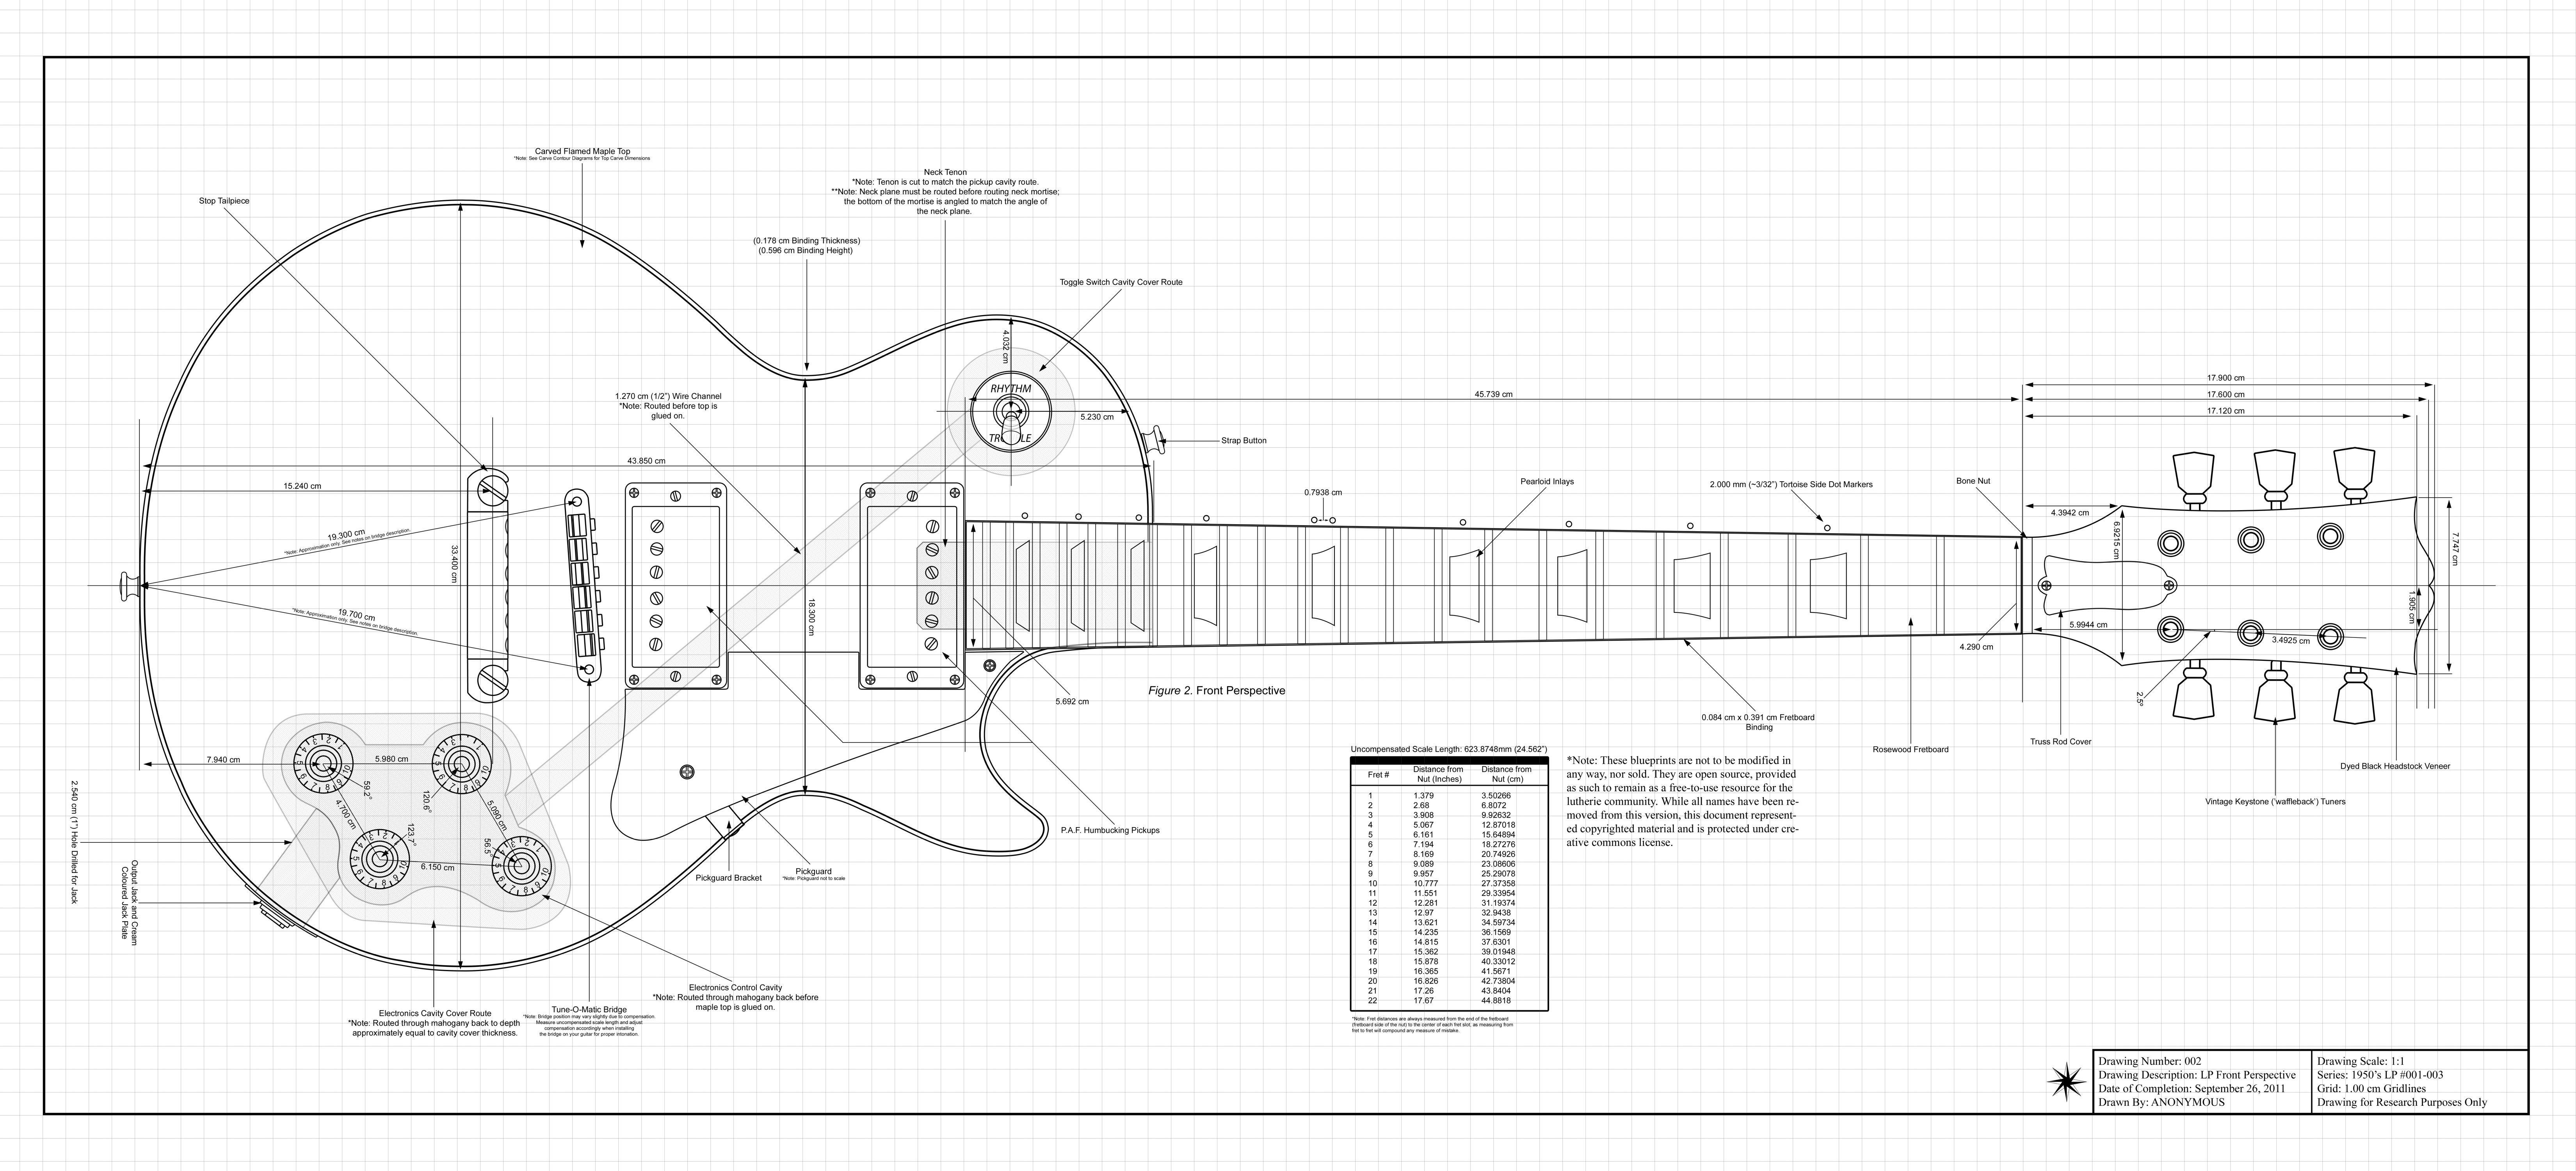 The 21 Best Wiring Diagram Creator Https Bacamajalah Com The 21 Best Wiring Diagram Creator Creator Dia Les Paul Floor Plan Creator Technical Drawing